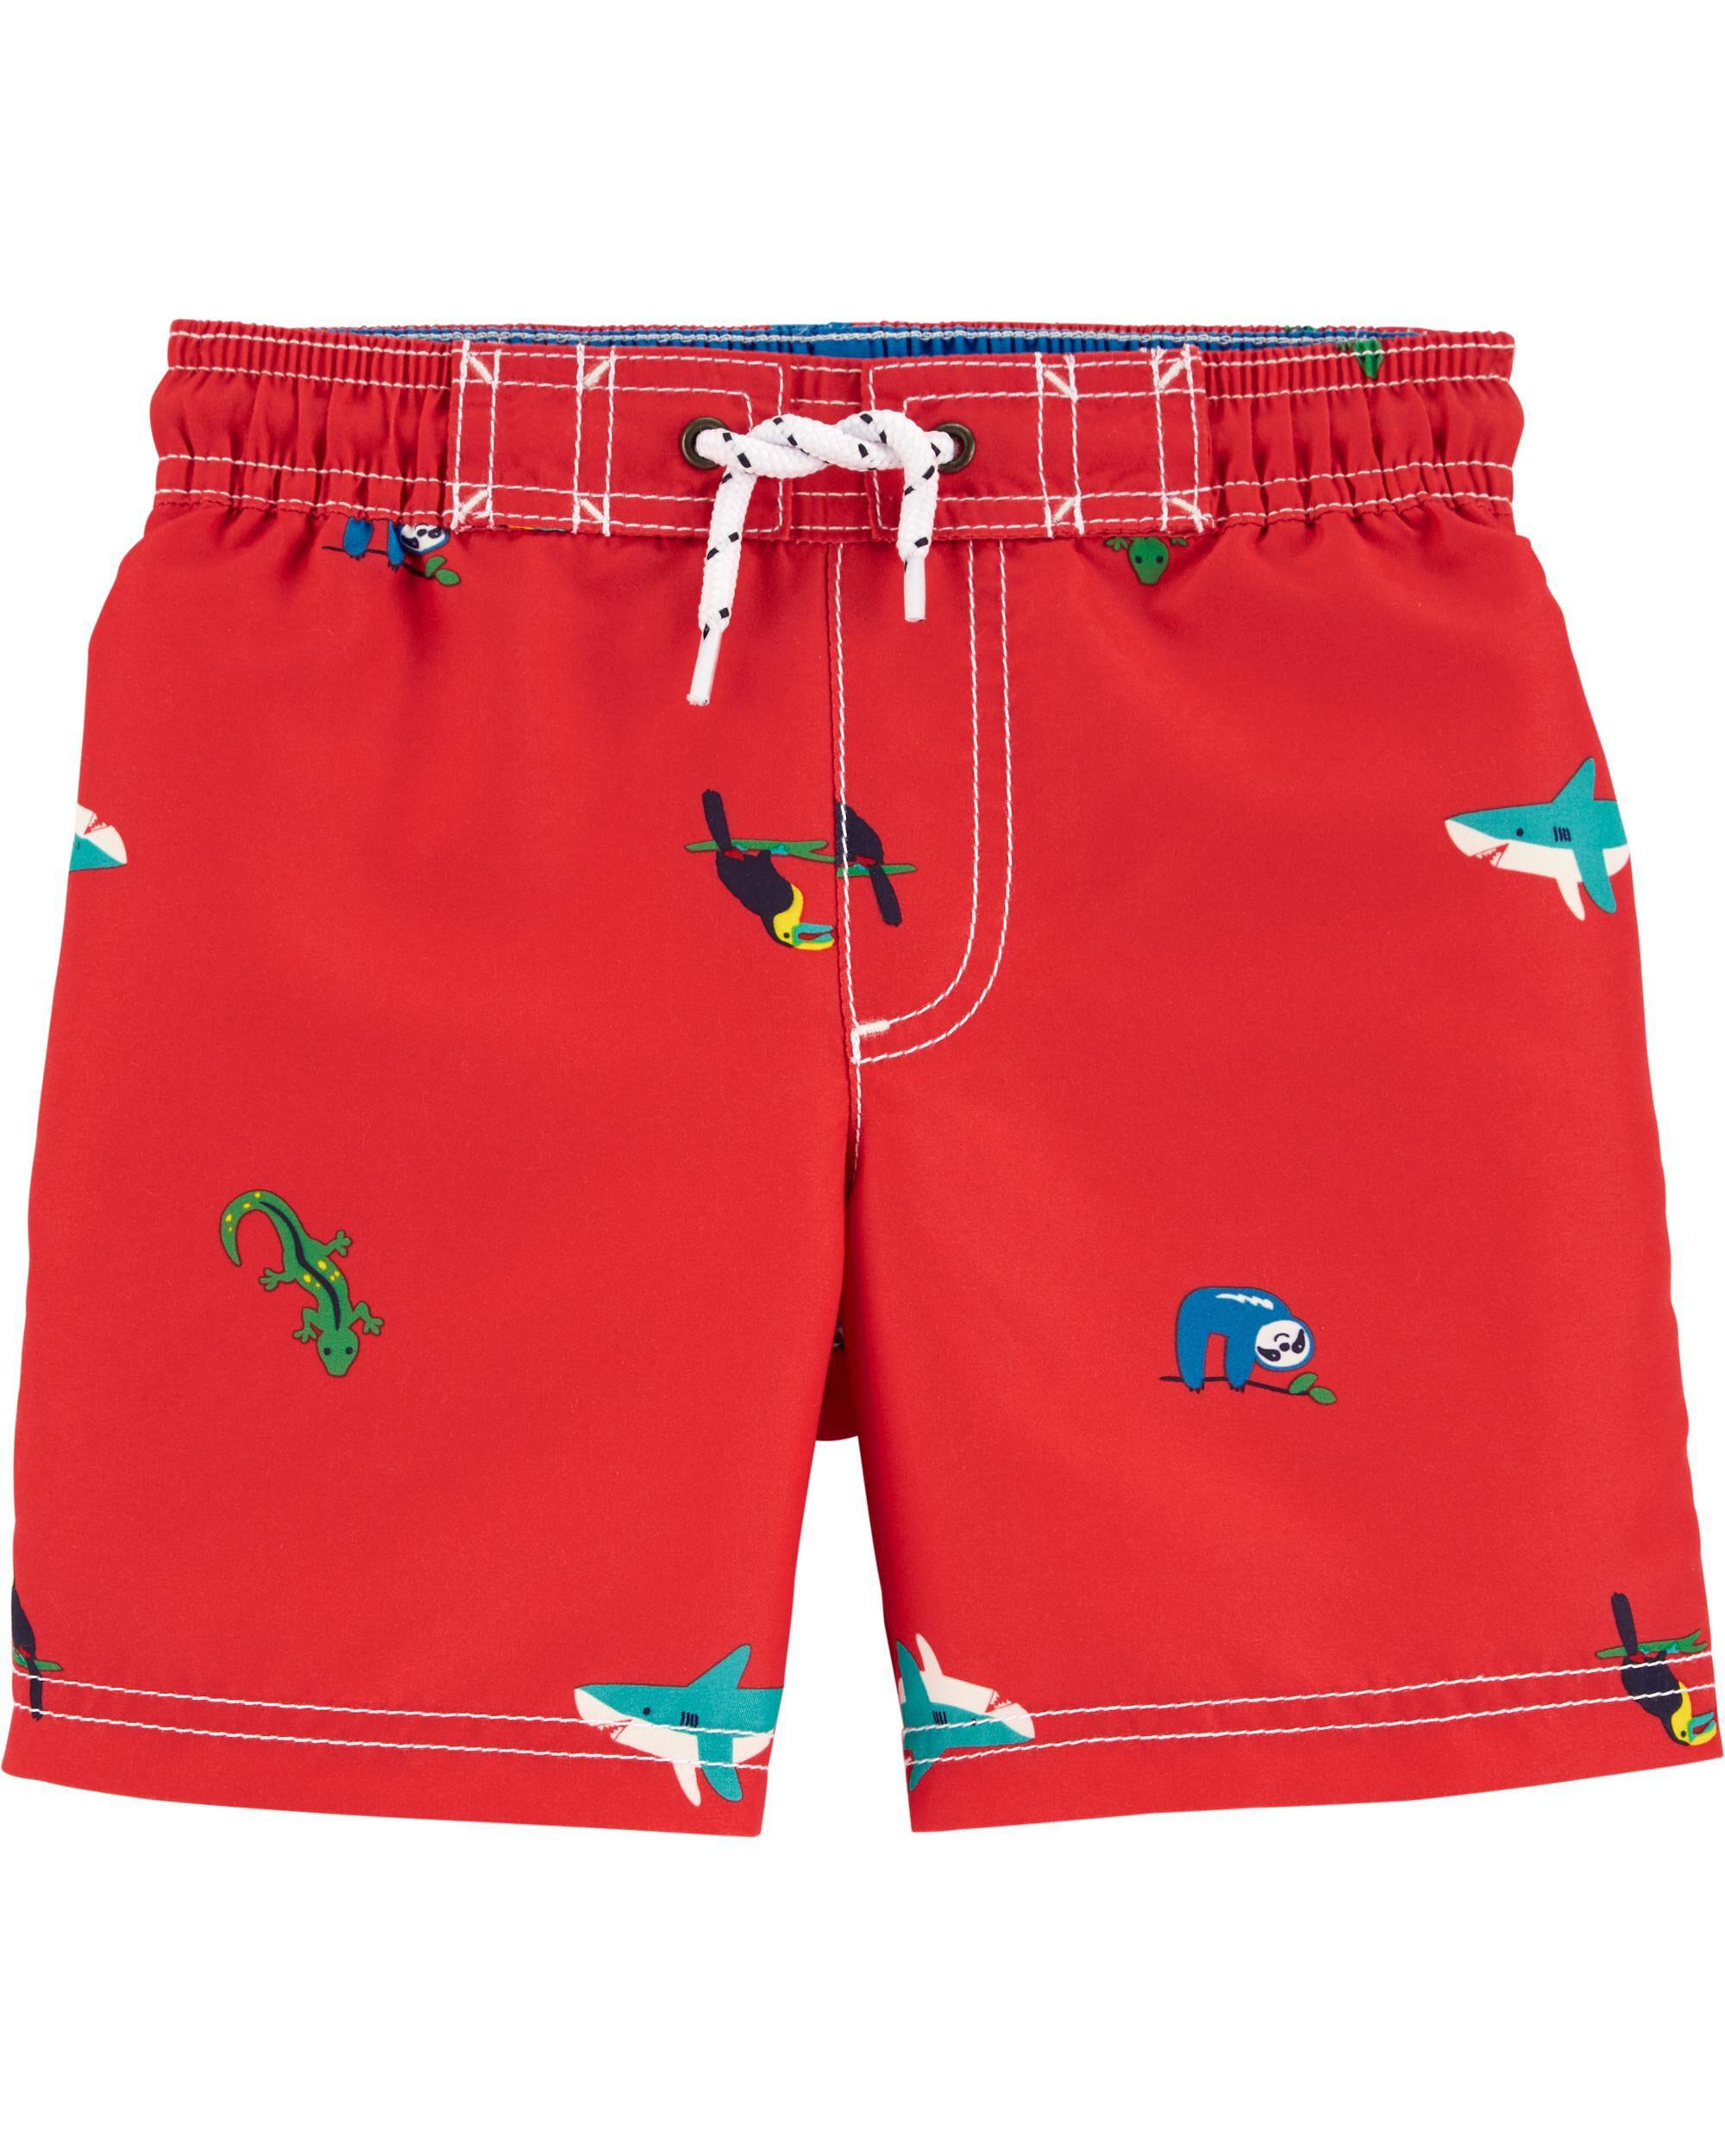 Boys Crocodile Pattern Swim Shorts 9-12 Months